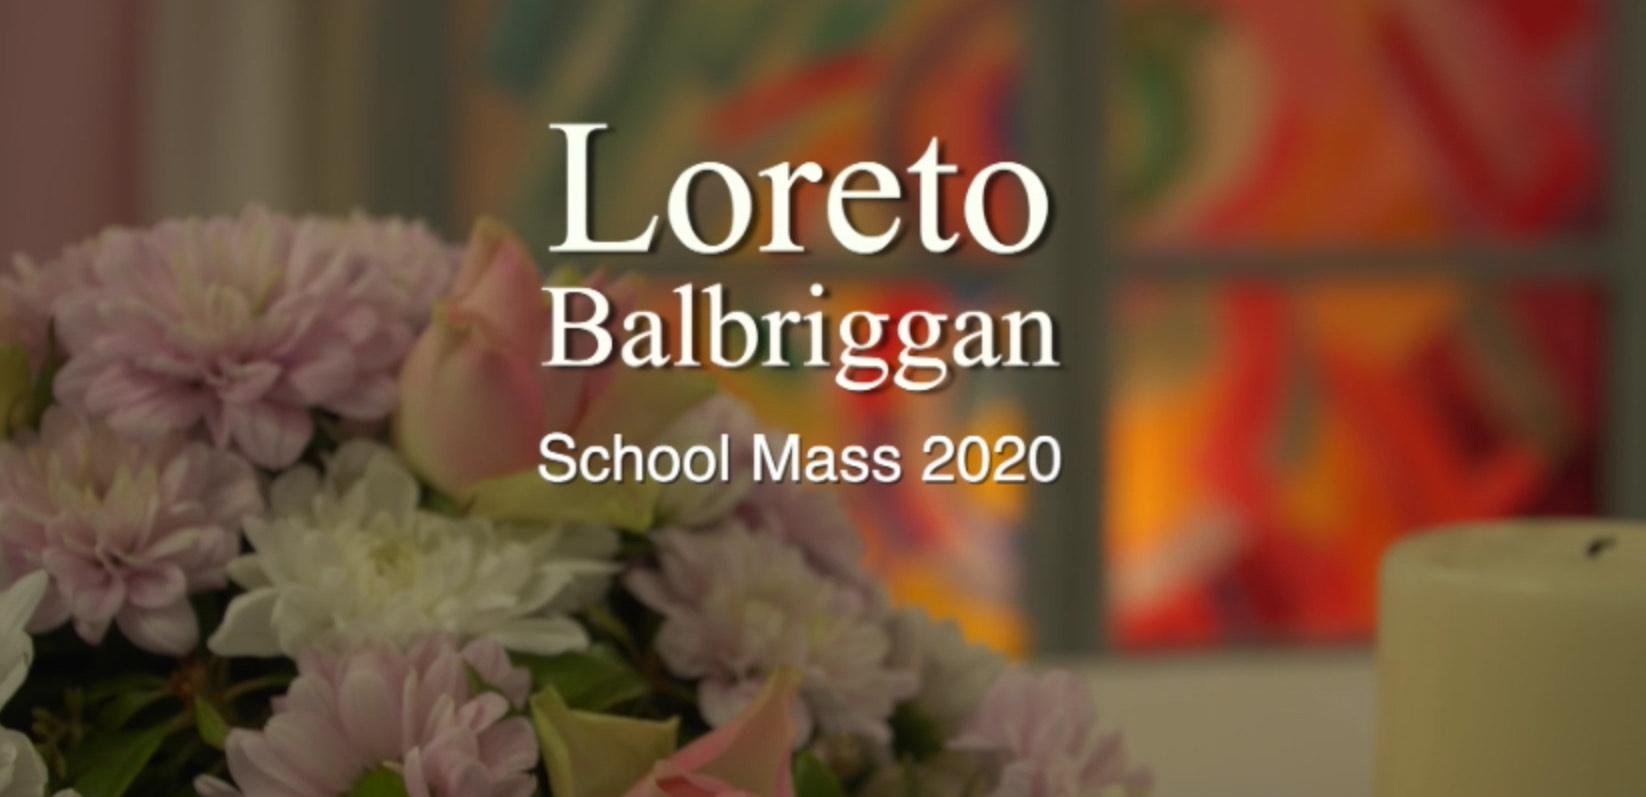 Loreto Balbriggan